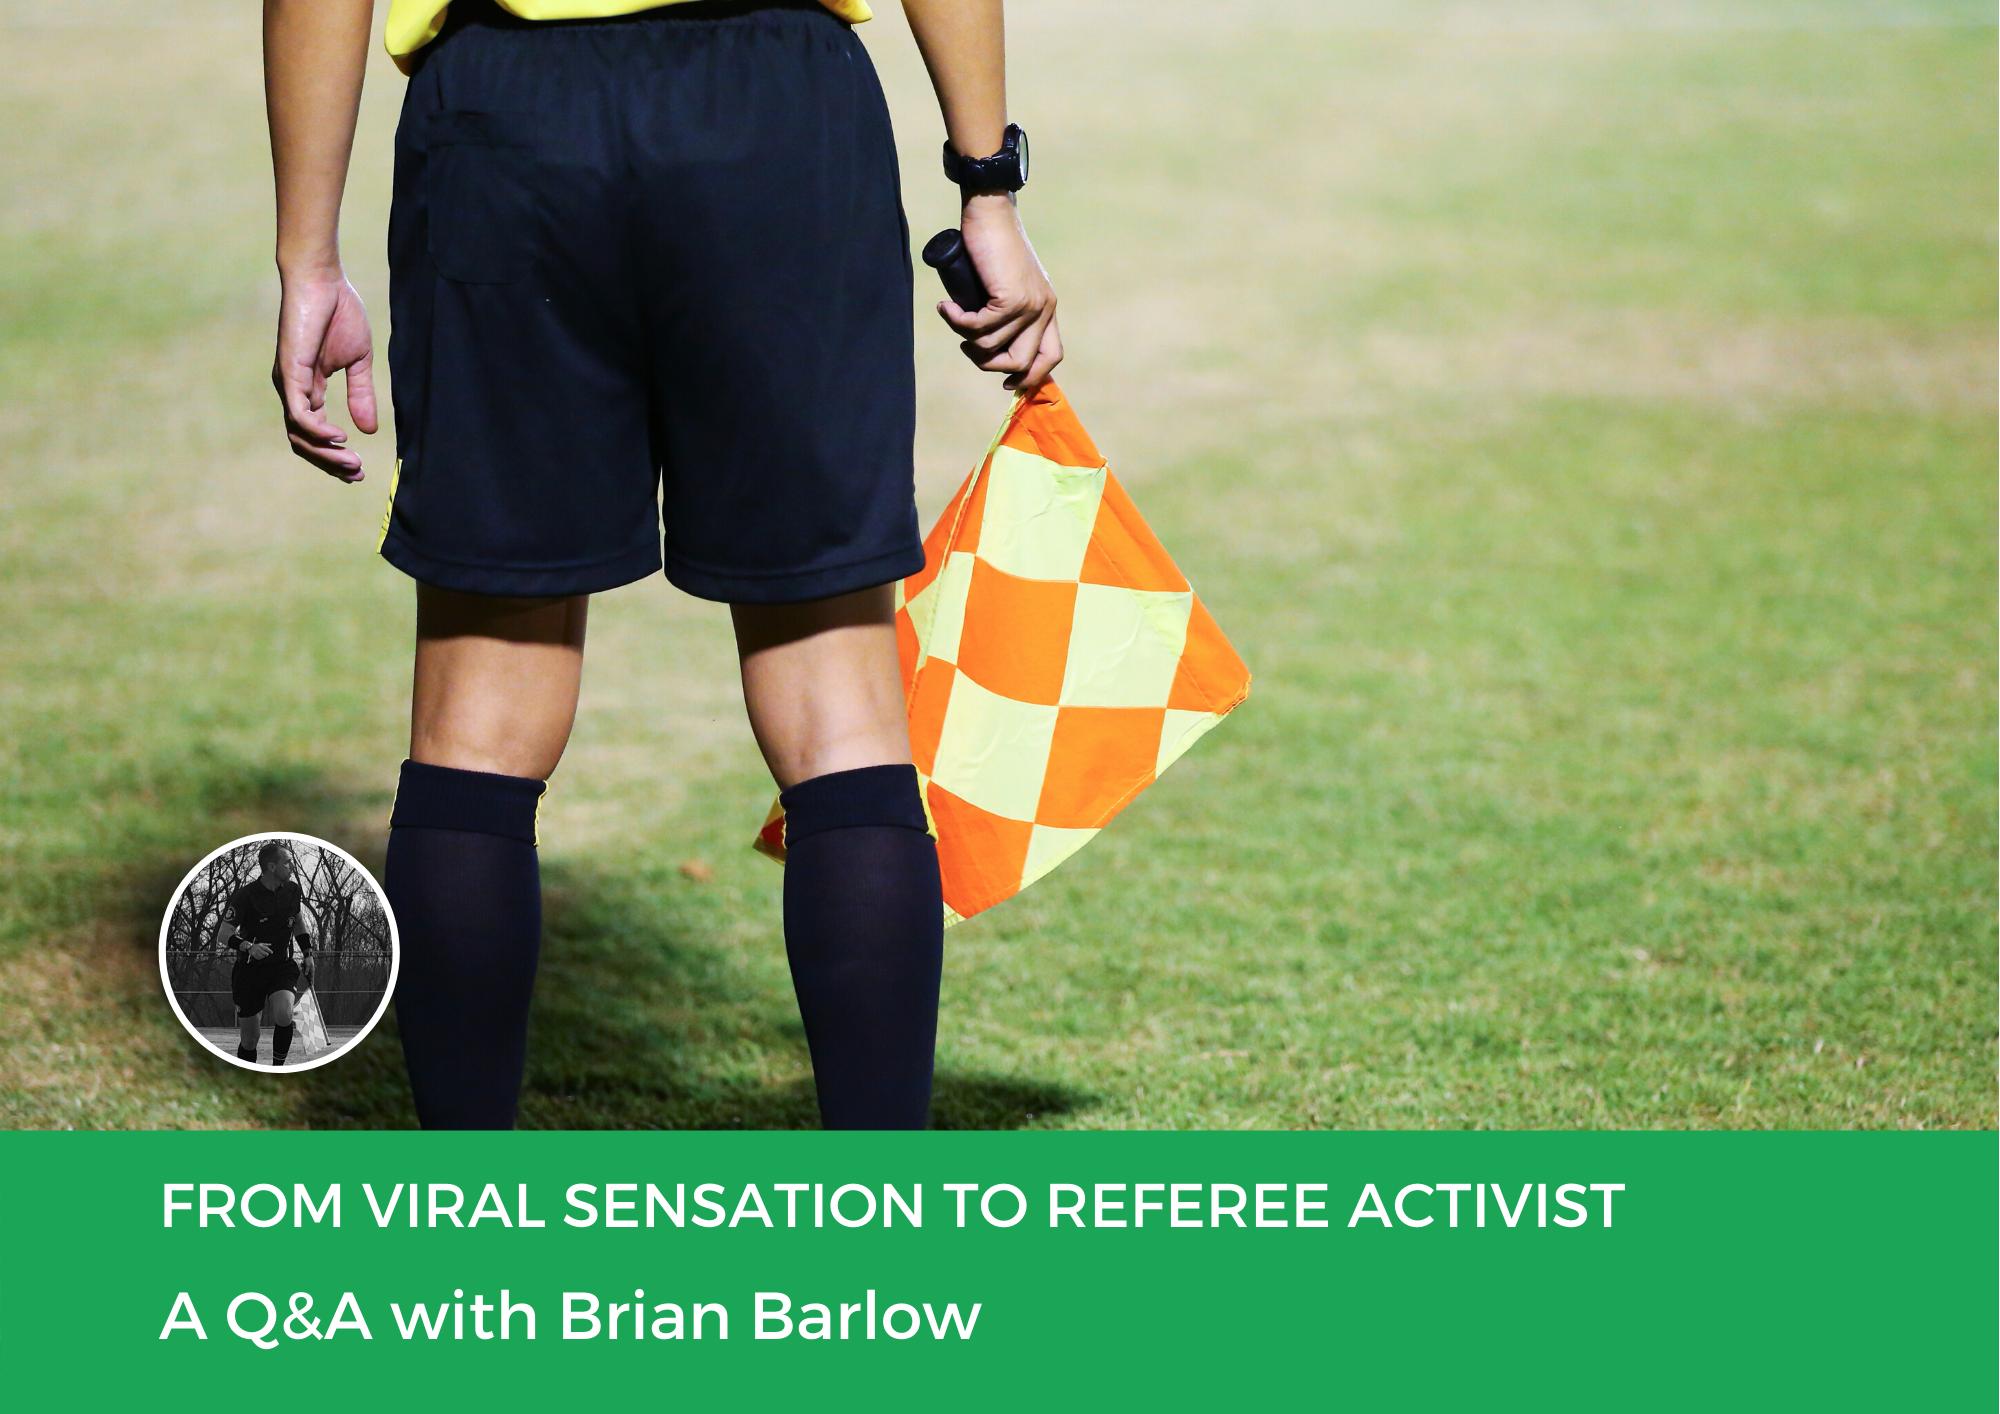 From Viral Sensation to Referee Activist: Brian Barlow